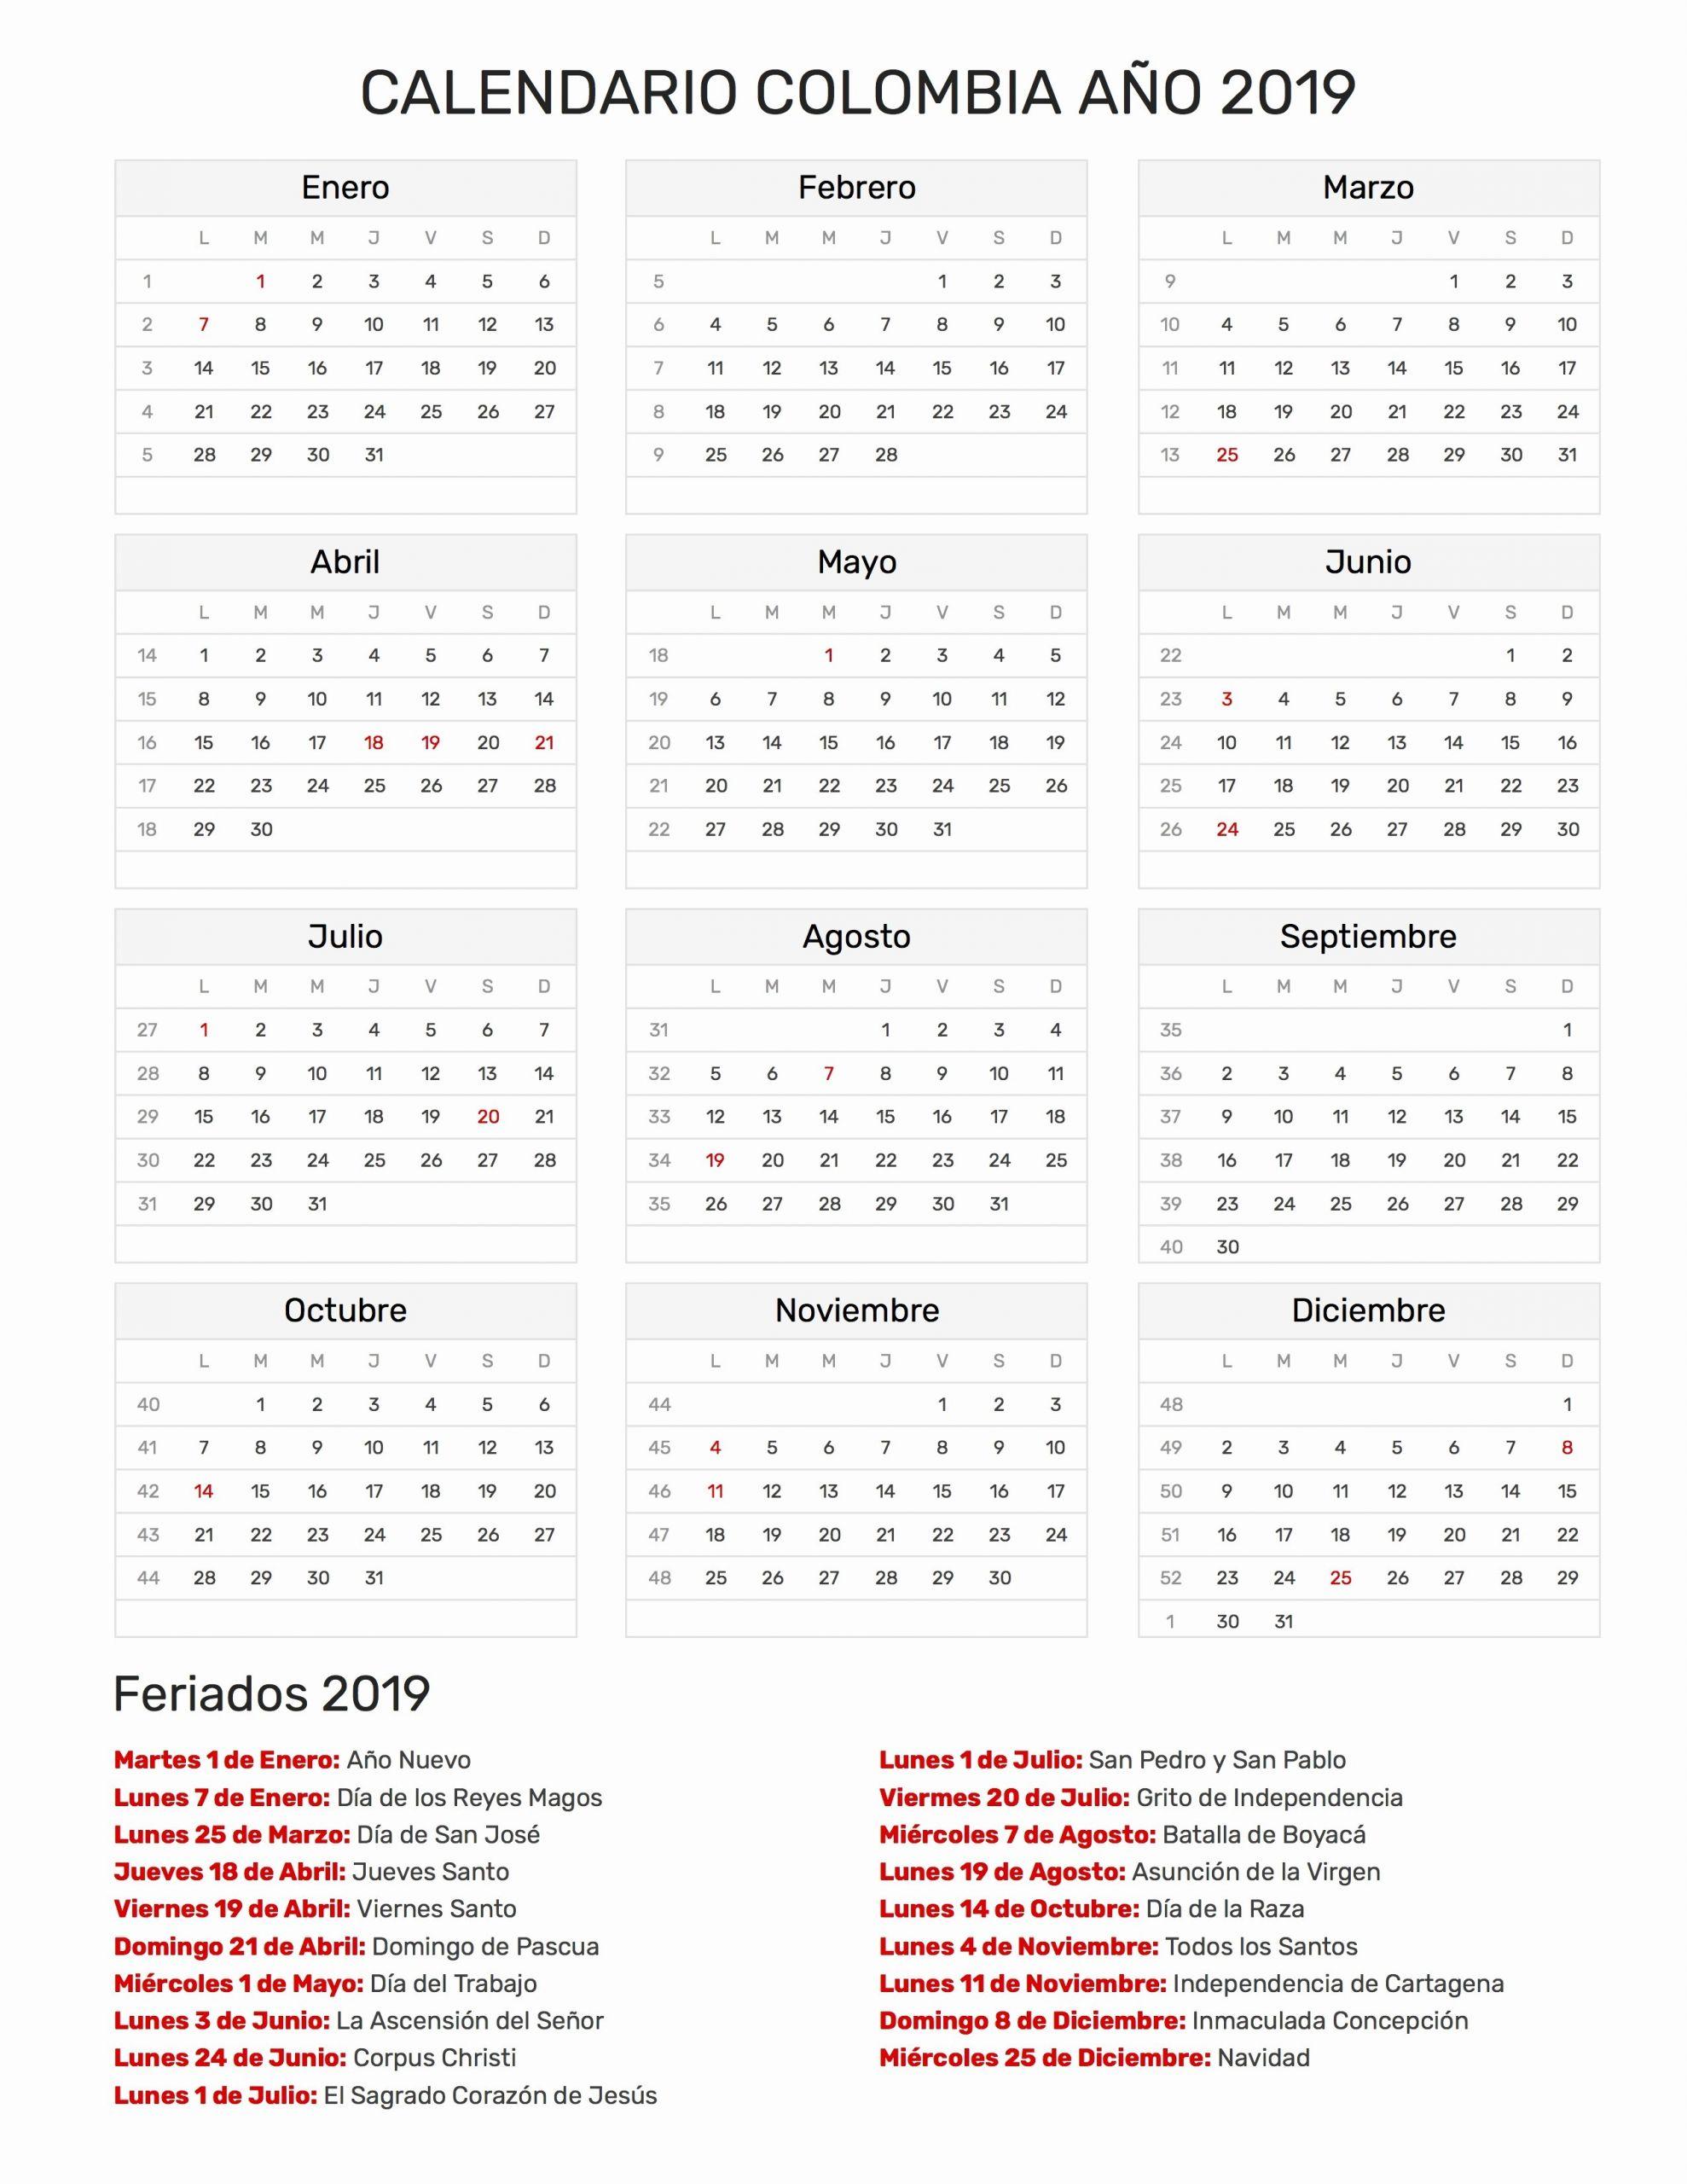 calendario escolar 2019 dias festivos mas populares calendario dr 2019 calendario colombia ano 2019 feriados of calendario escolar 2019 dias festivos